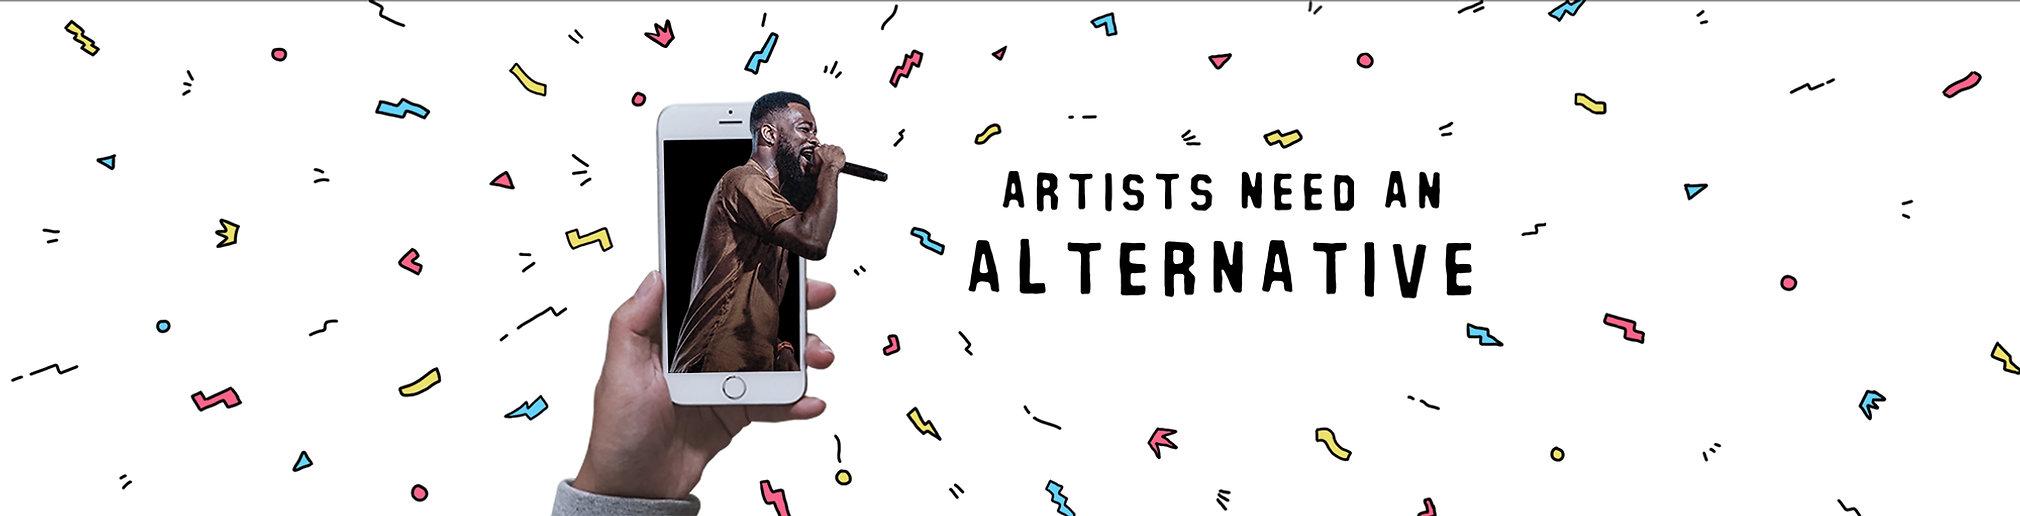 ARTISTS ALTERNATIVE HQ 2-1.jpg